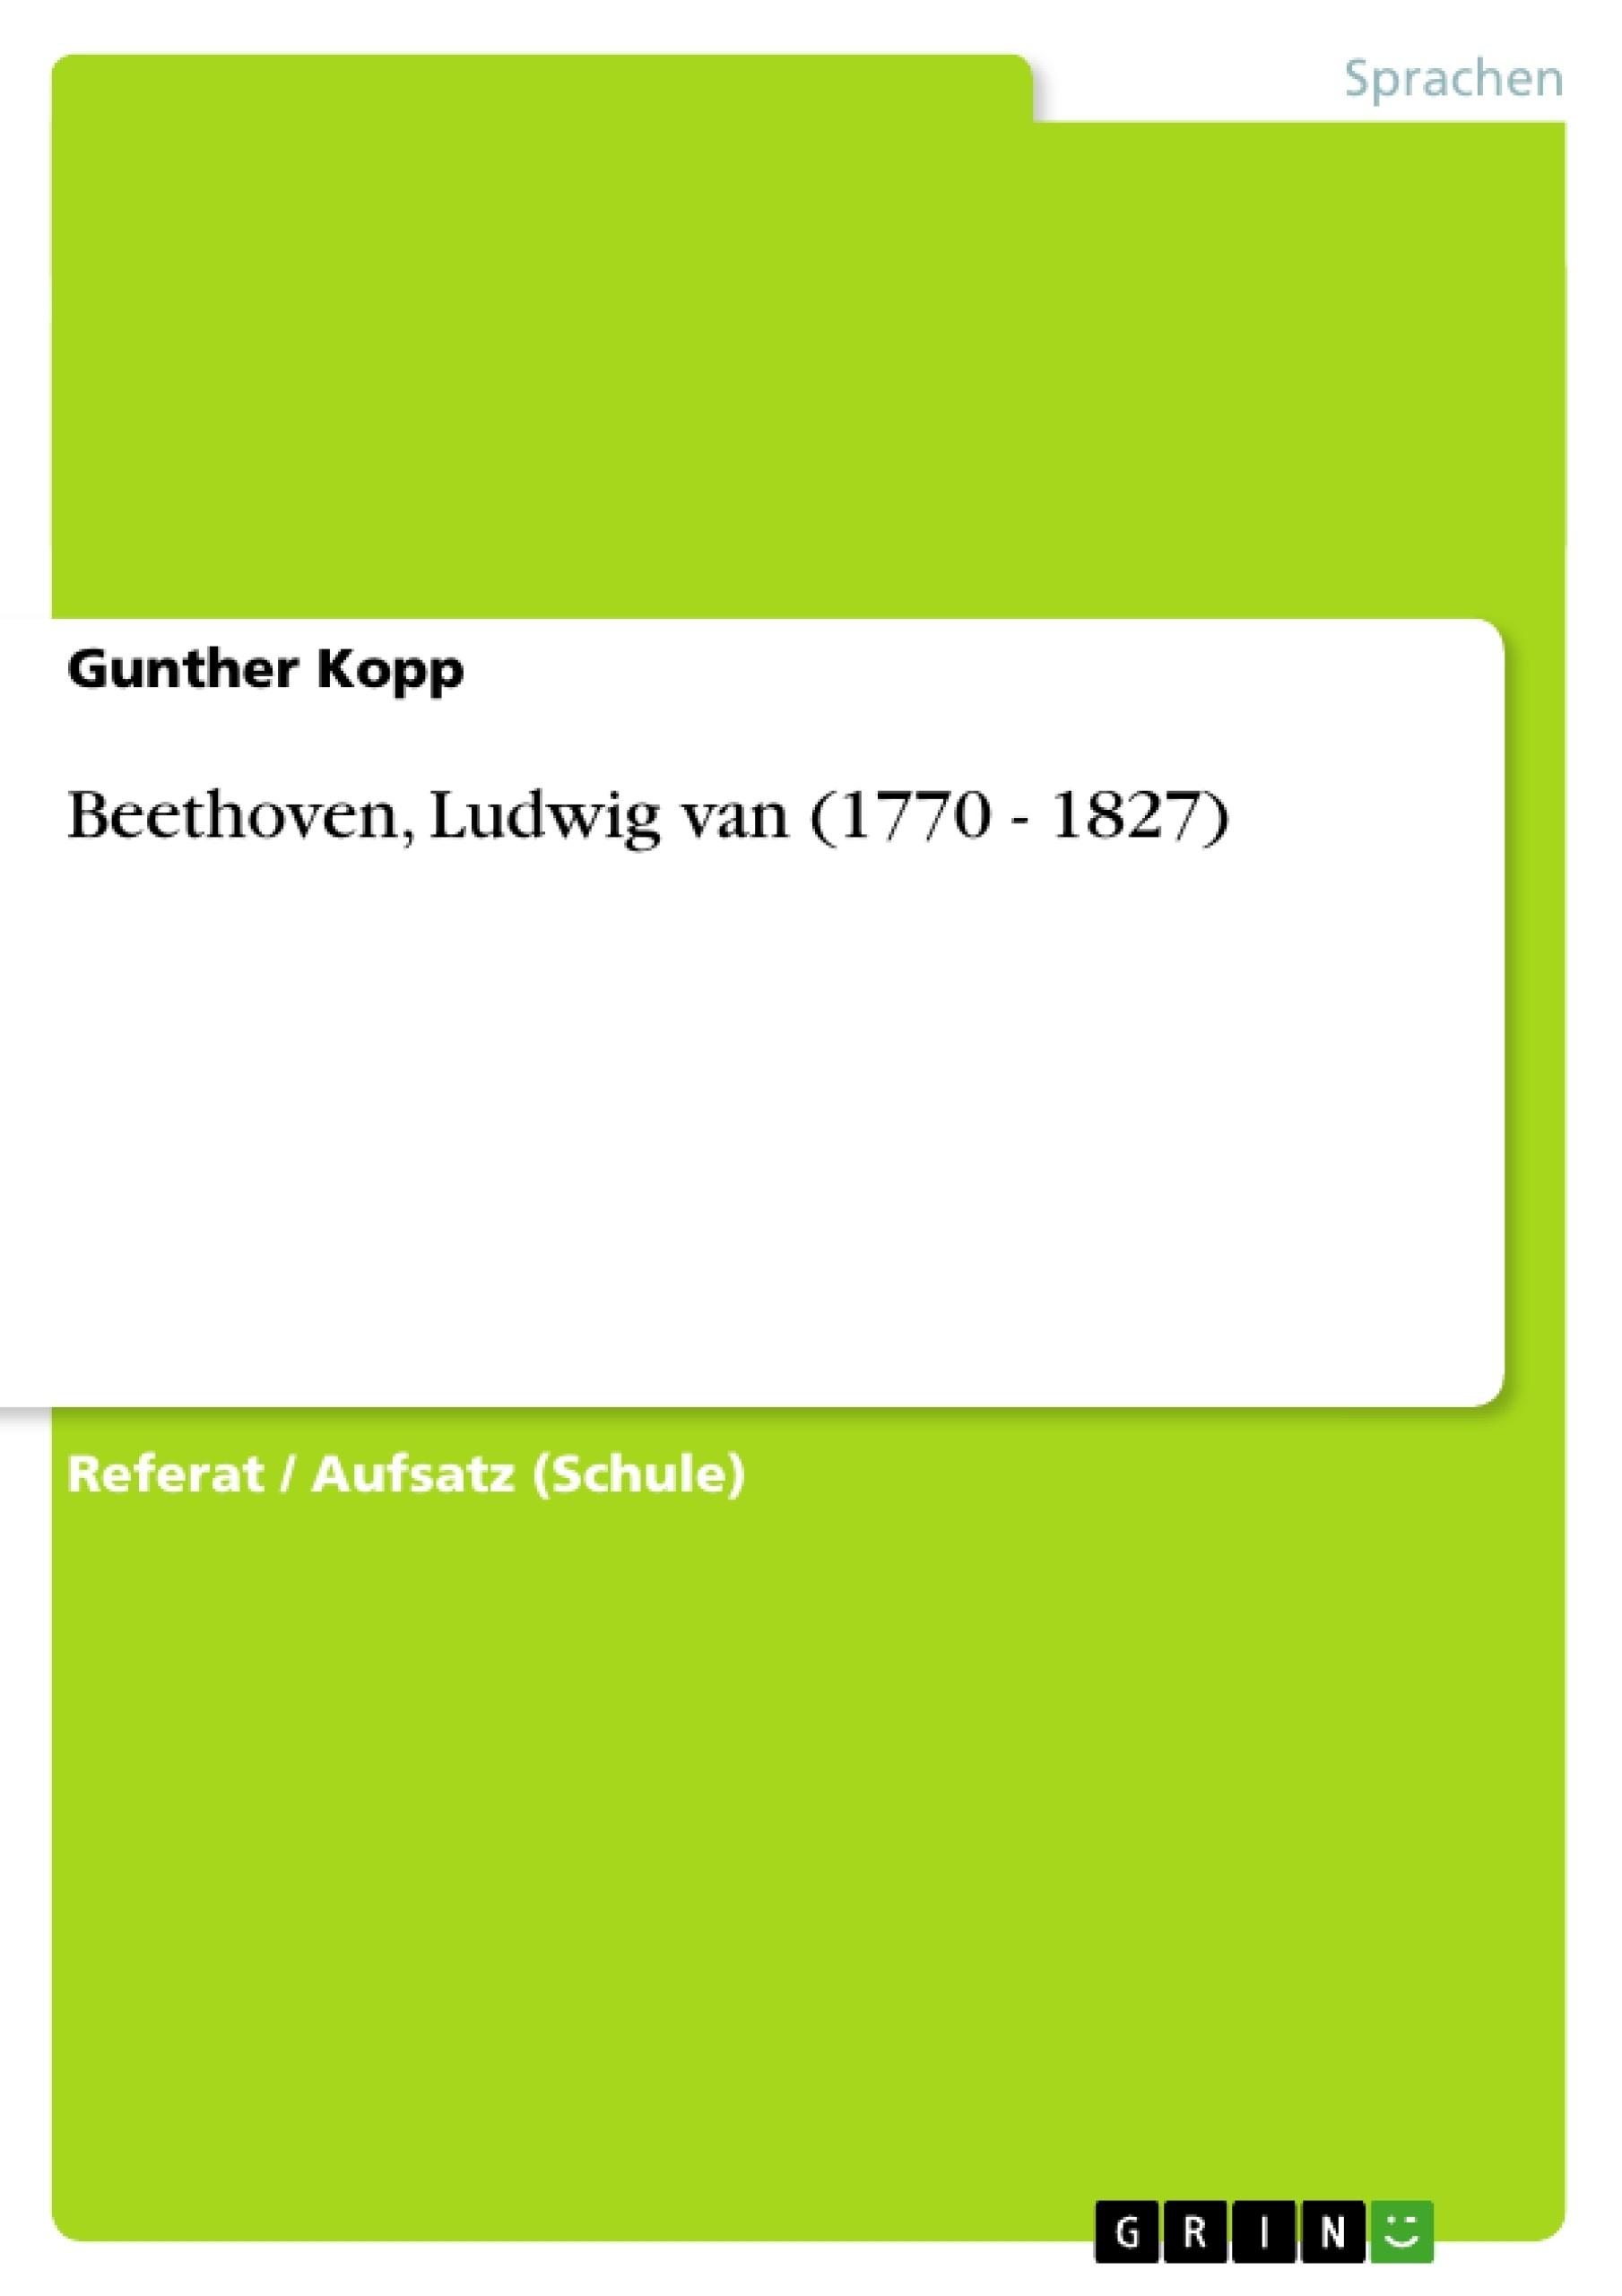 Titel: Beethoven, Ludwig van (1770 - 1827)